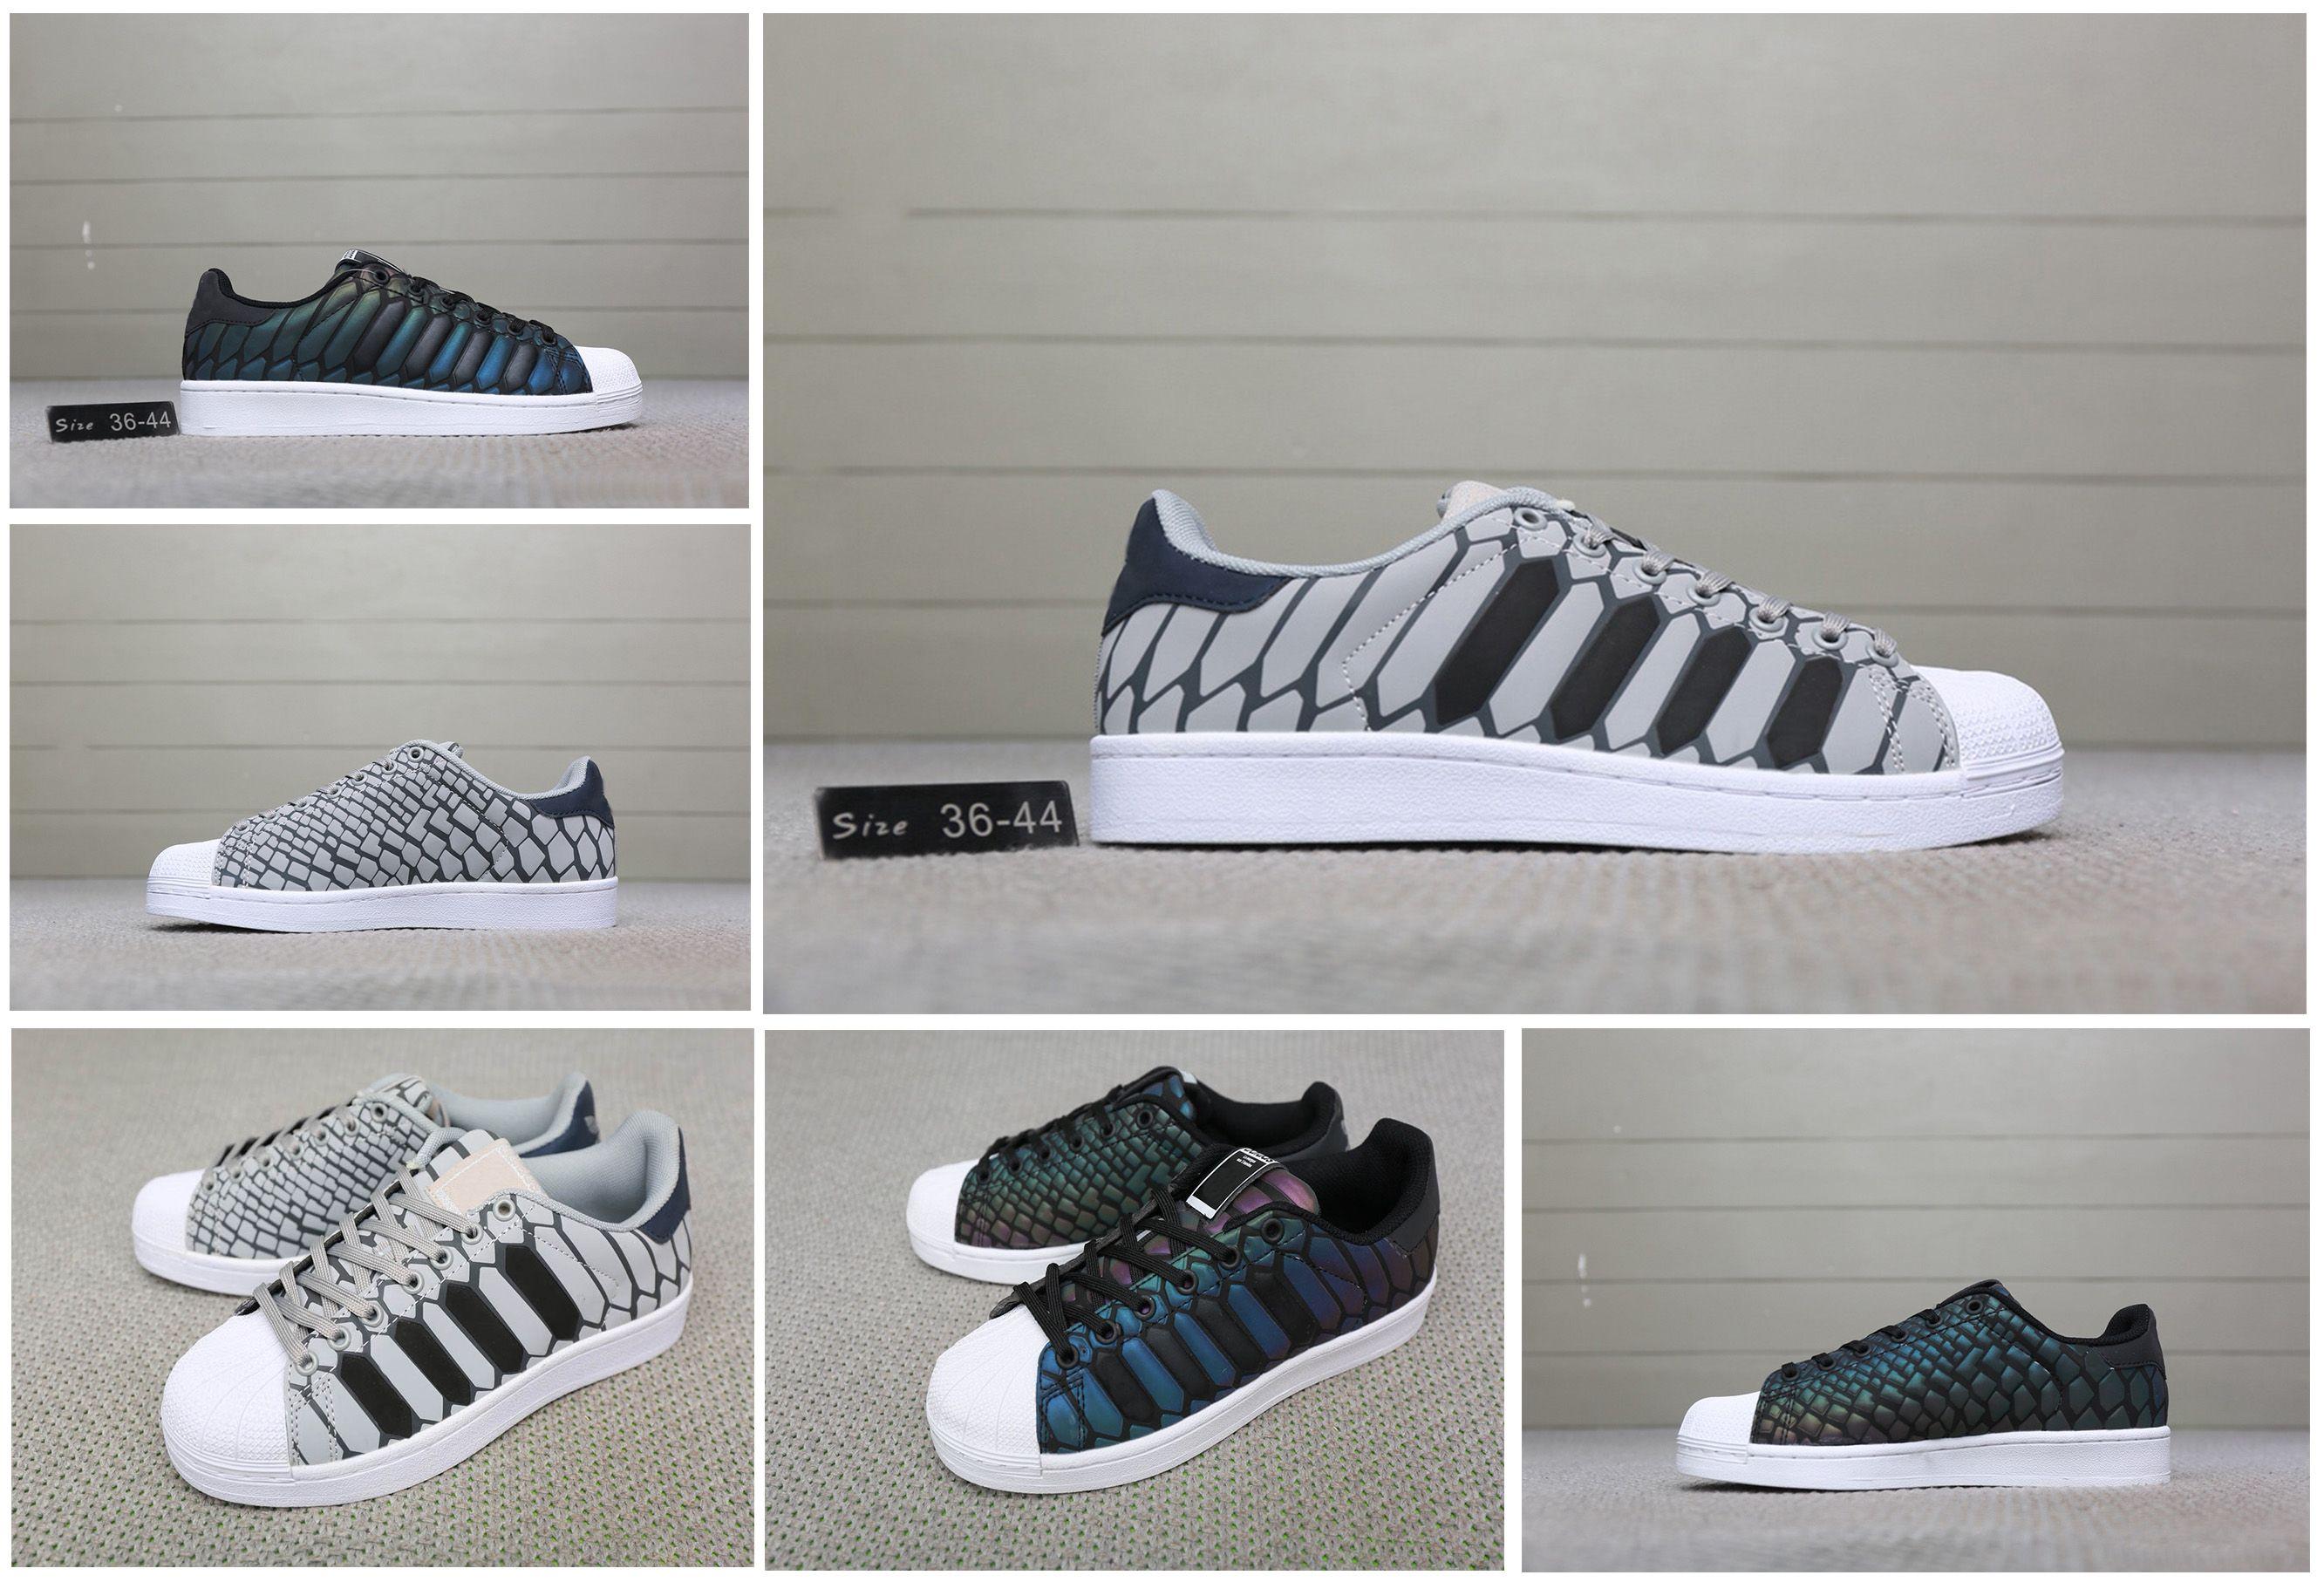 4c13283d873ef ... shop großhandel adidas superstar xeno mens running shoes 2018 neue  originale superstar designer shoes weiß hologramm